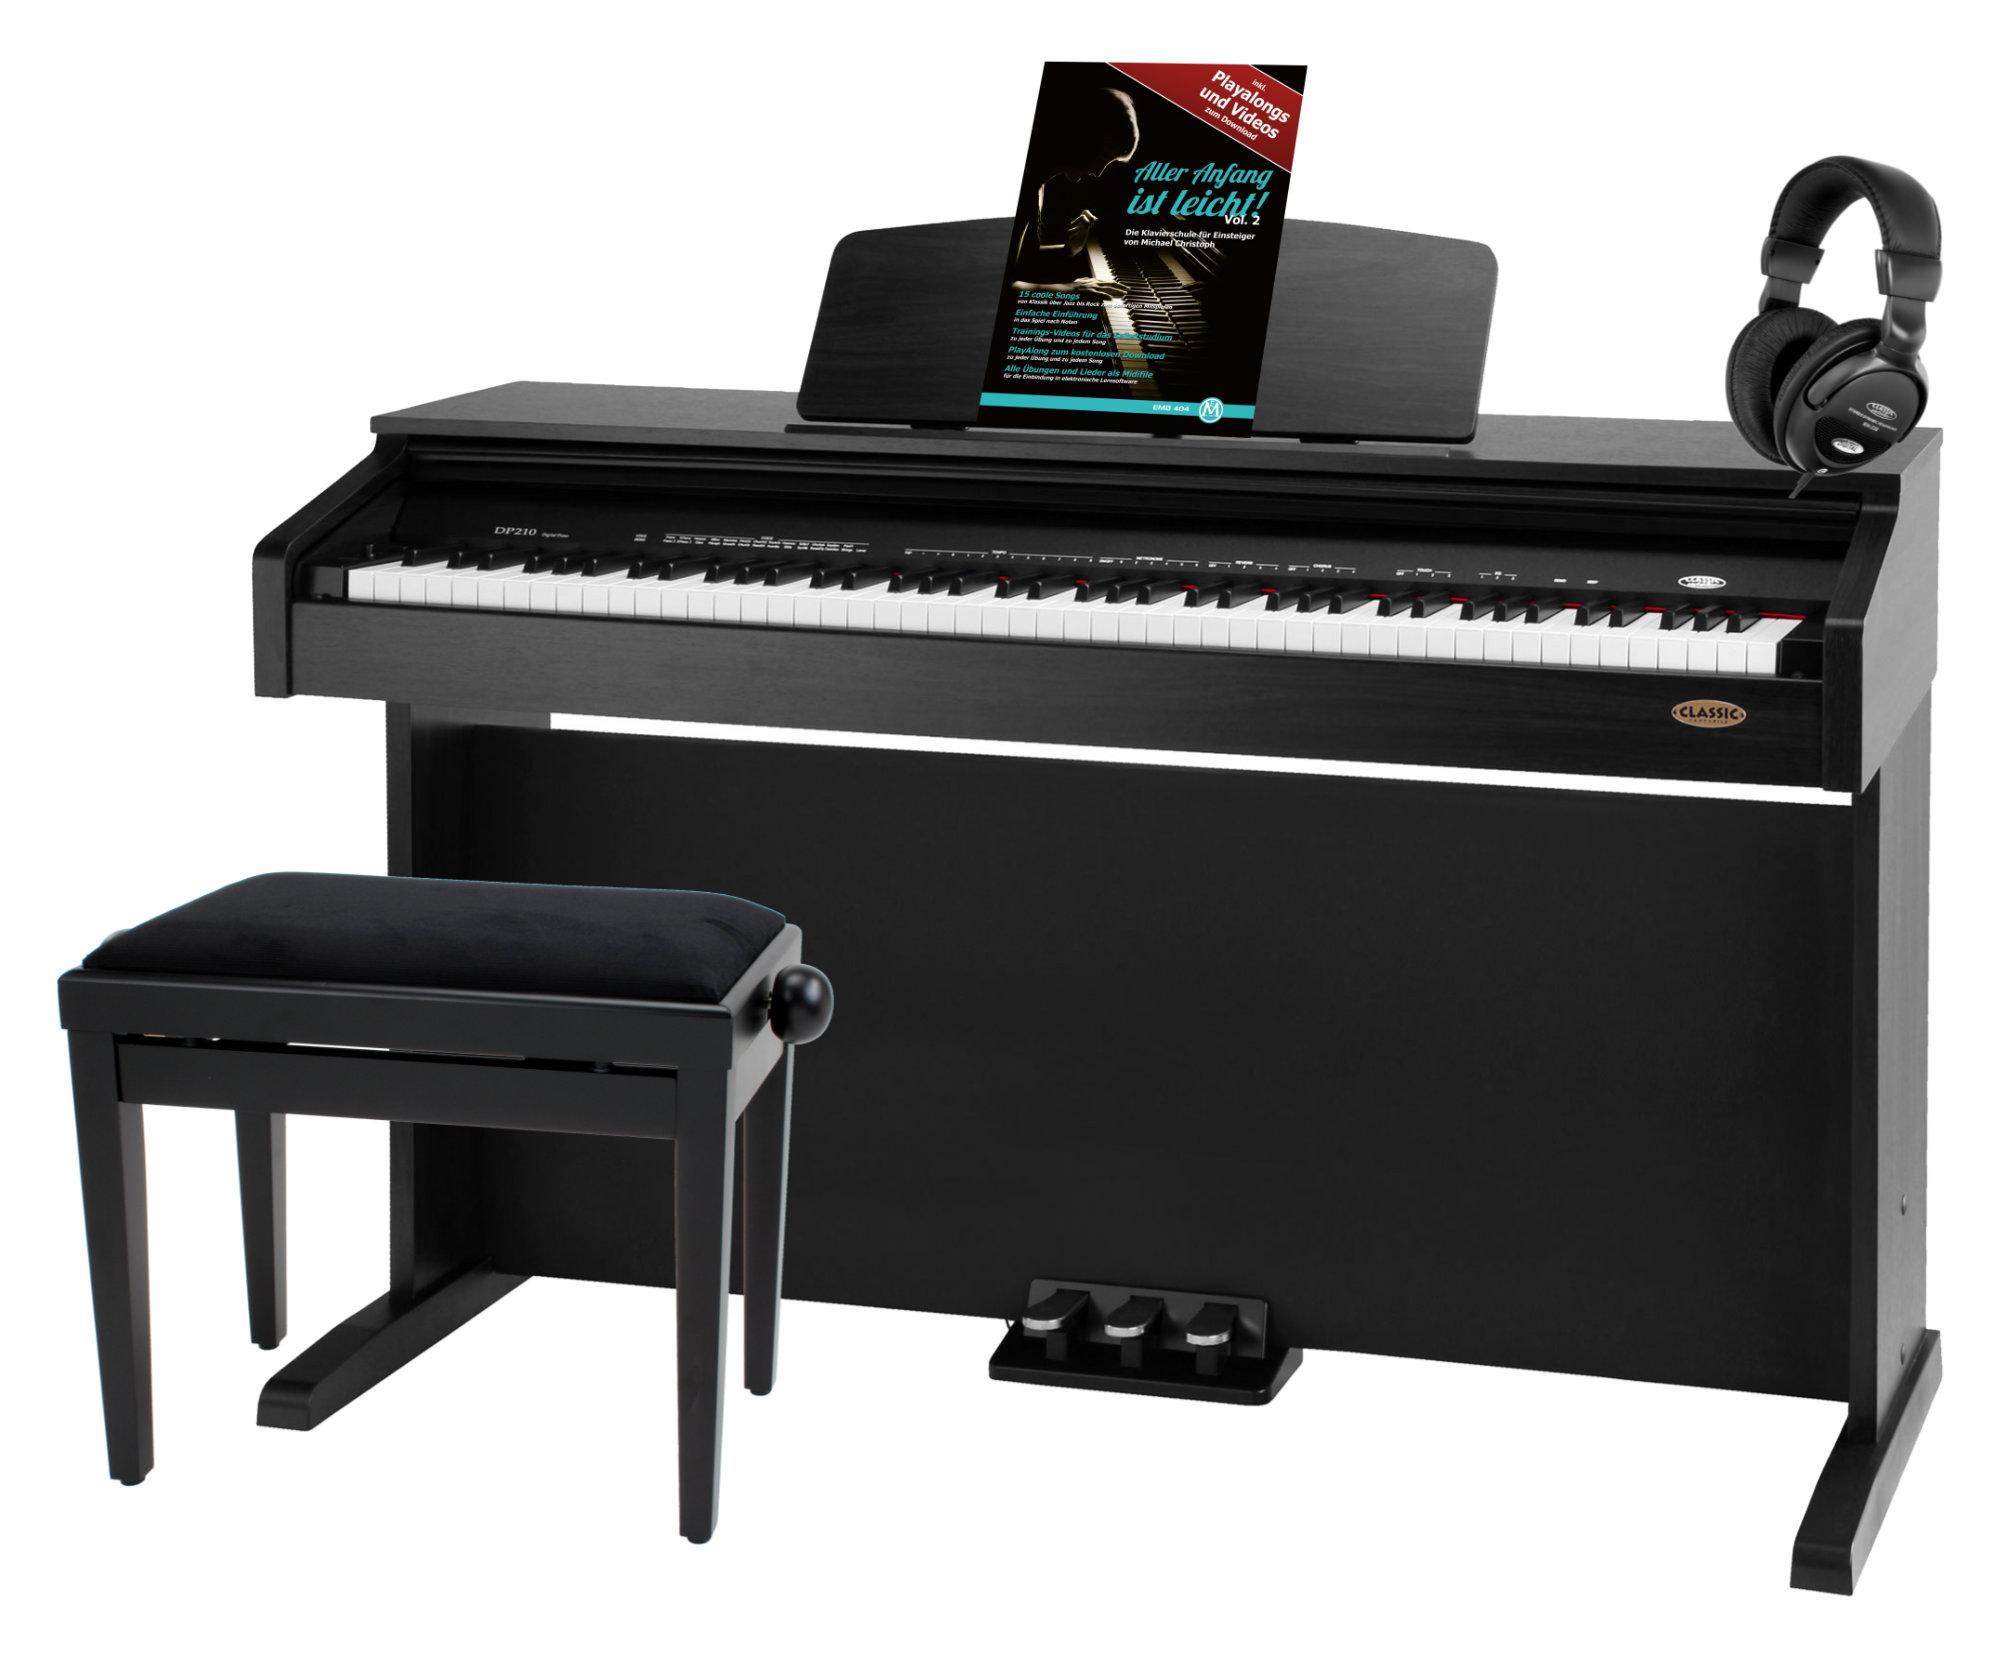 Classic Cantabile DP 210 SM E Piano schwarz matt SET inkl. Bank, Kopfhörer und Schule